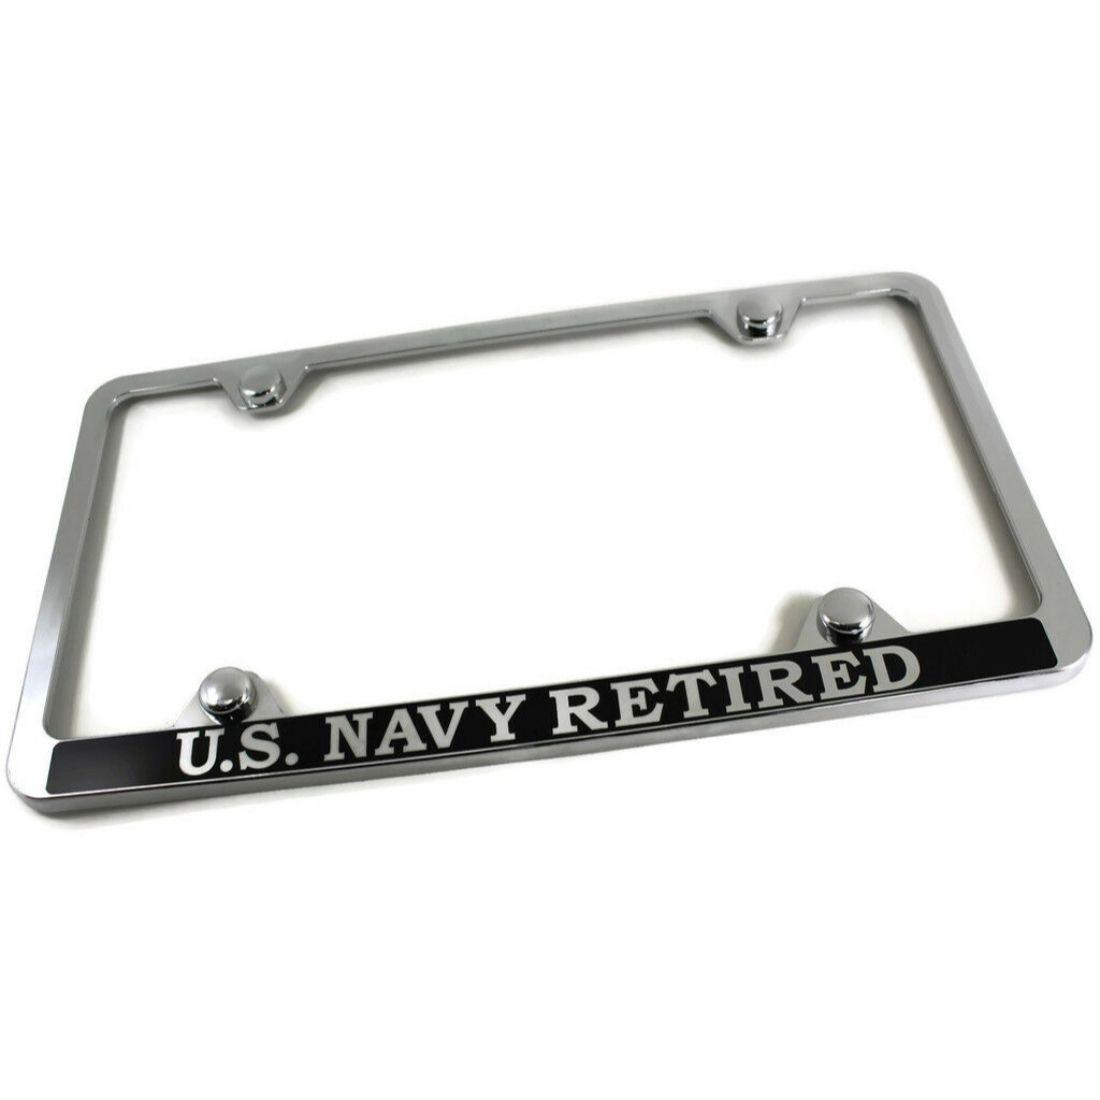 RETIRED US COAST GUARD Steel Metal License Plate Chrome//Black